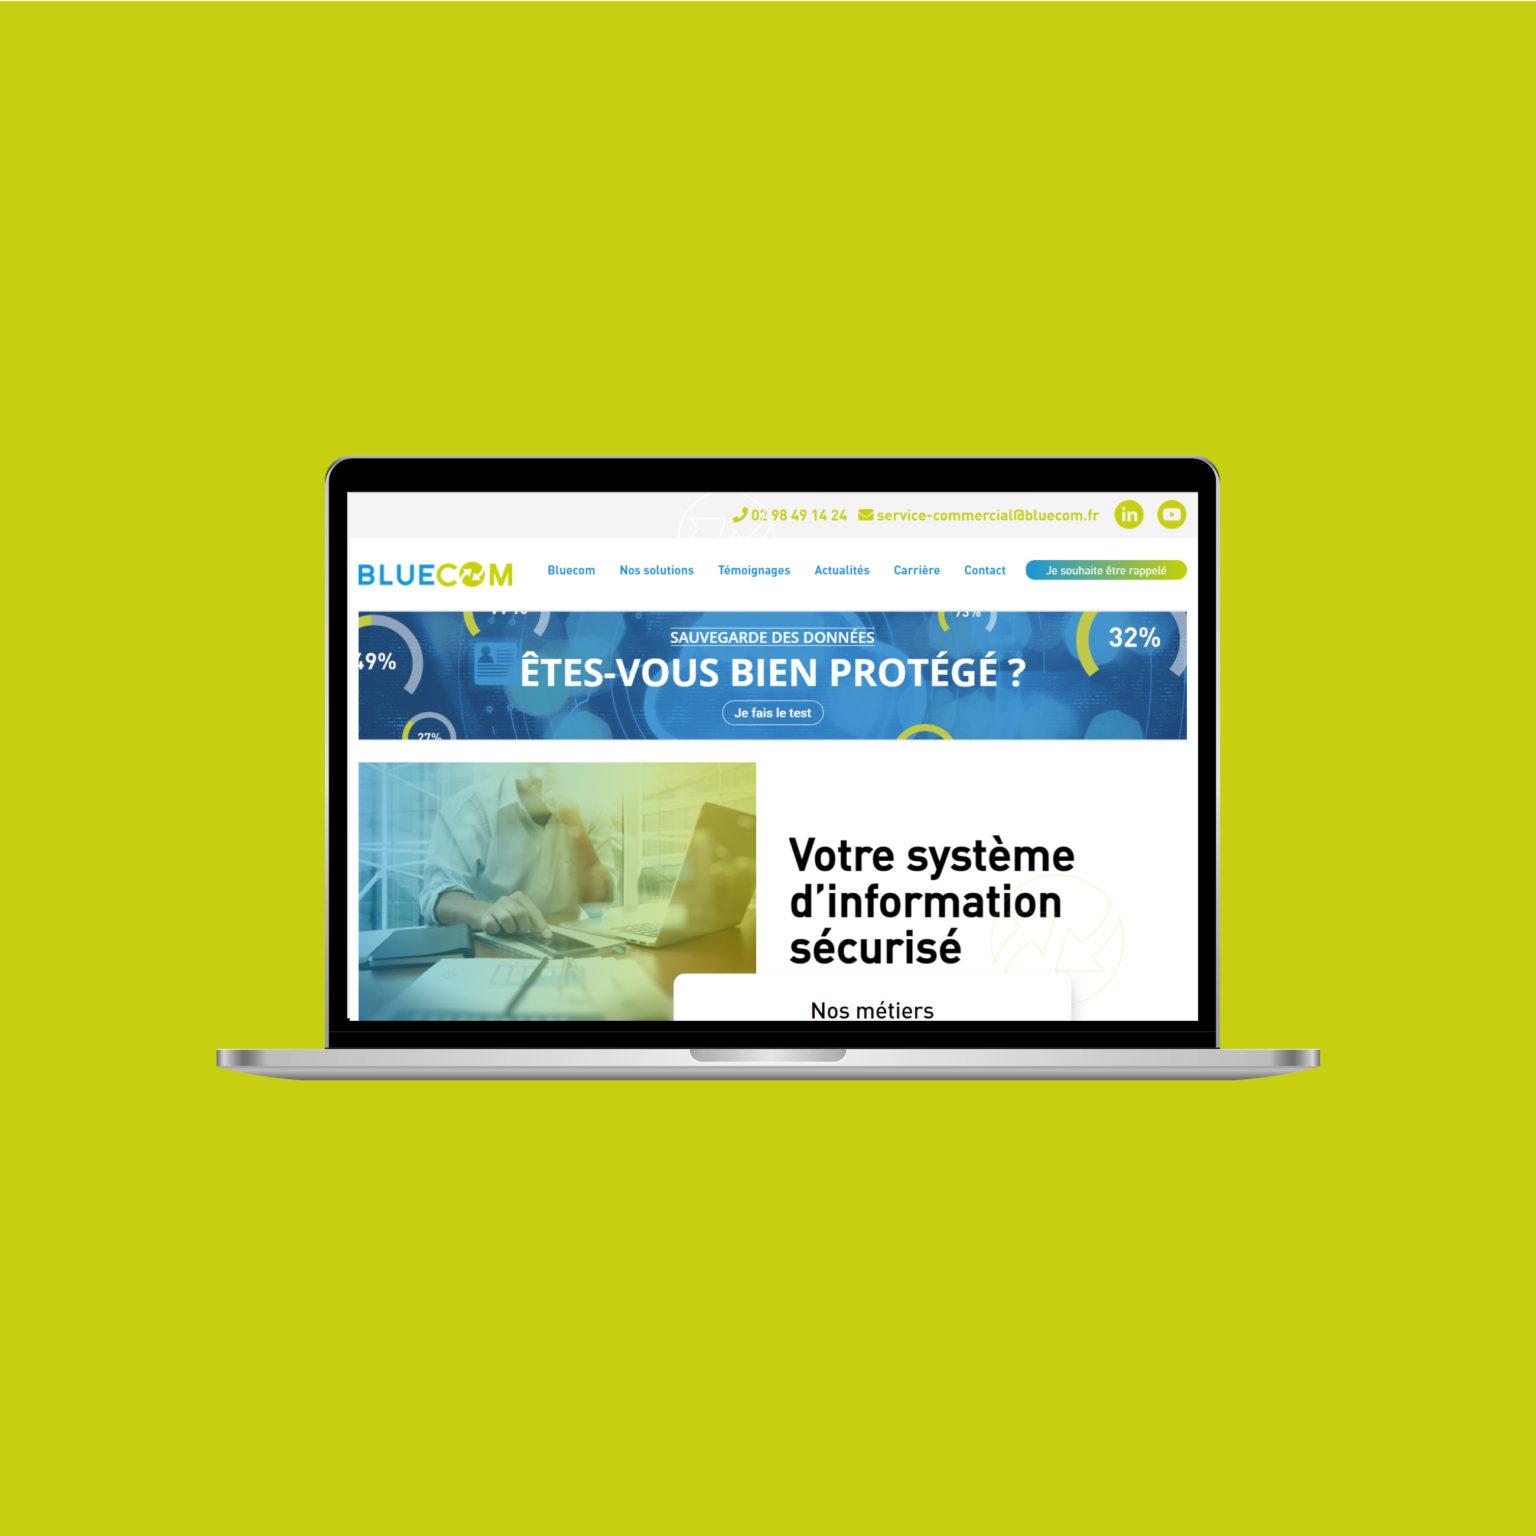 Miko Digital Agence web à Liège - Bluecom